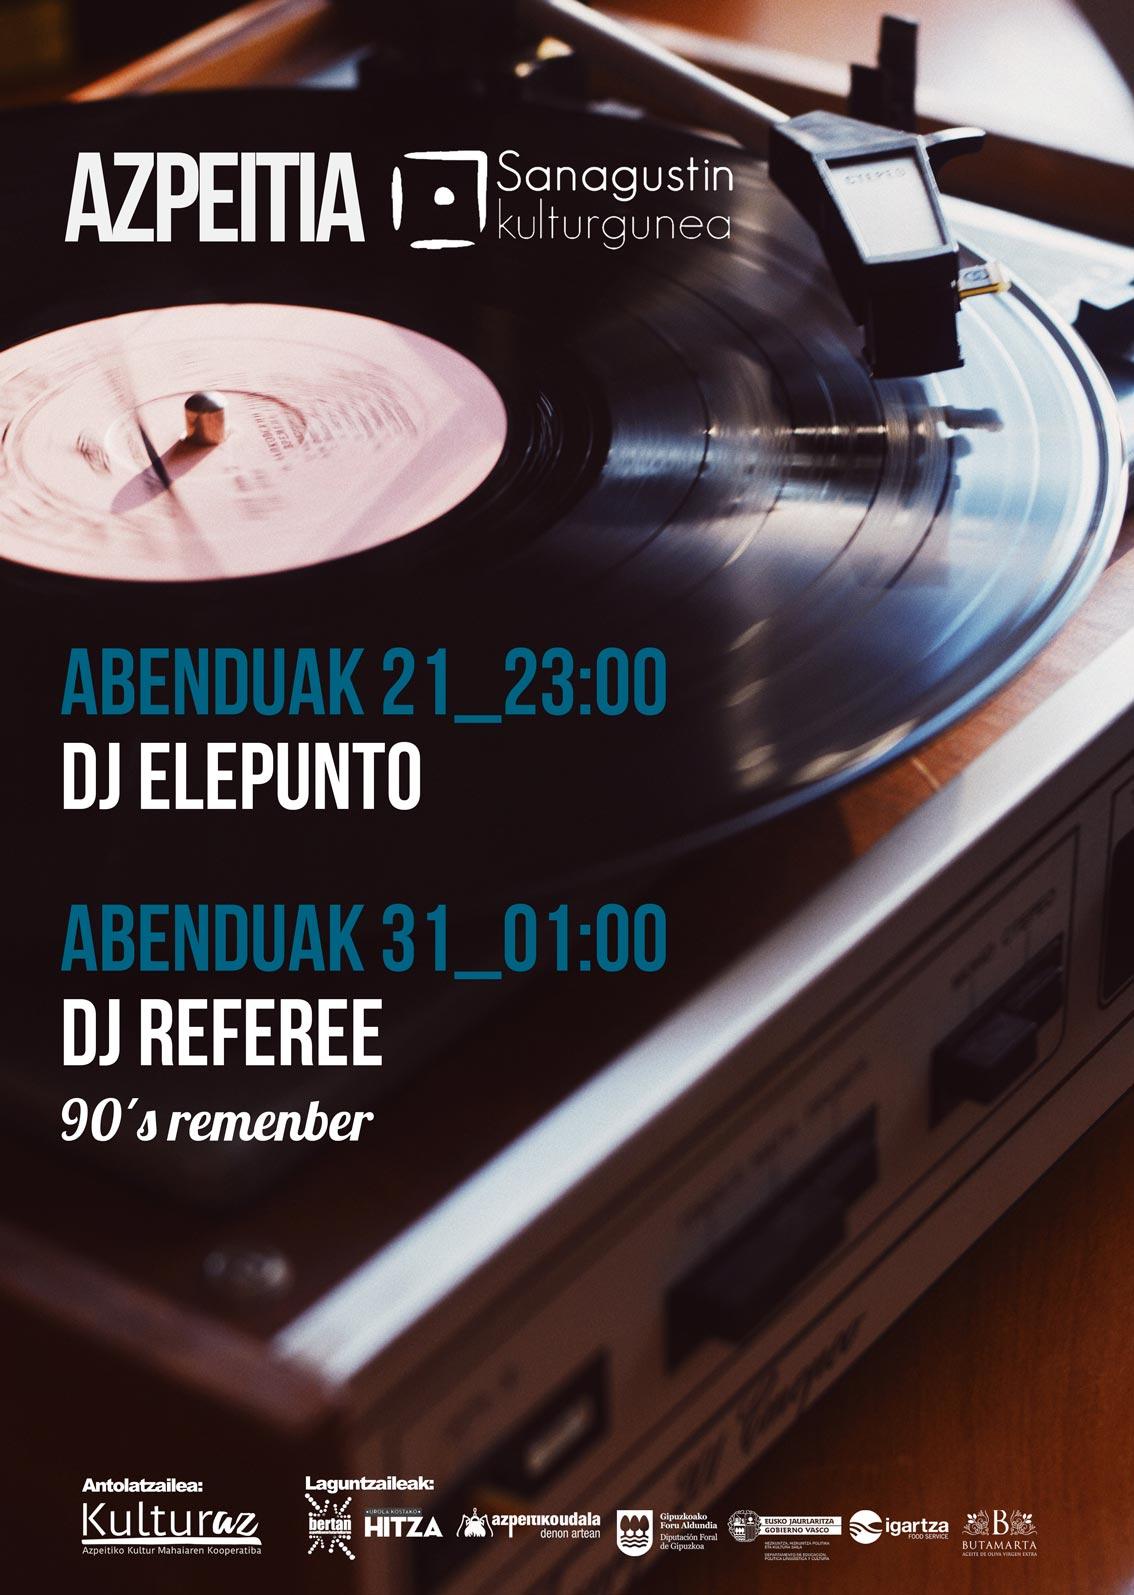 DJ Referee